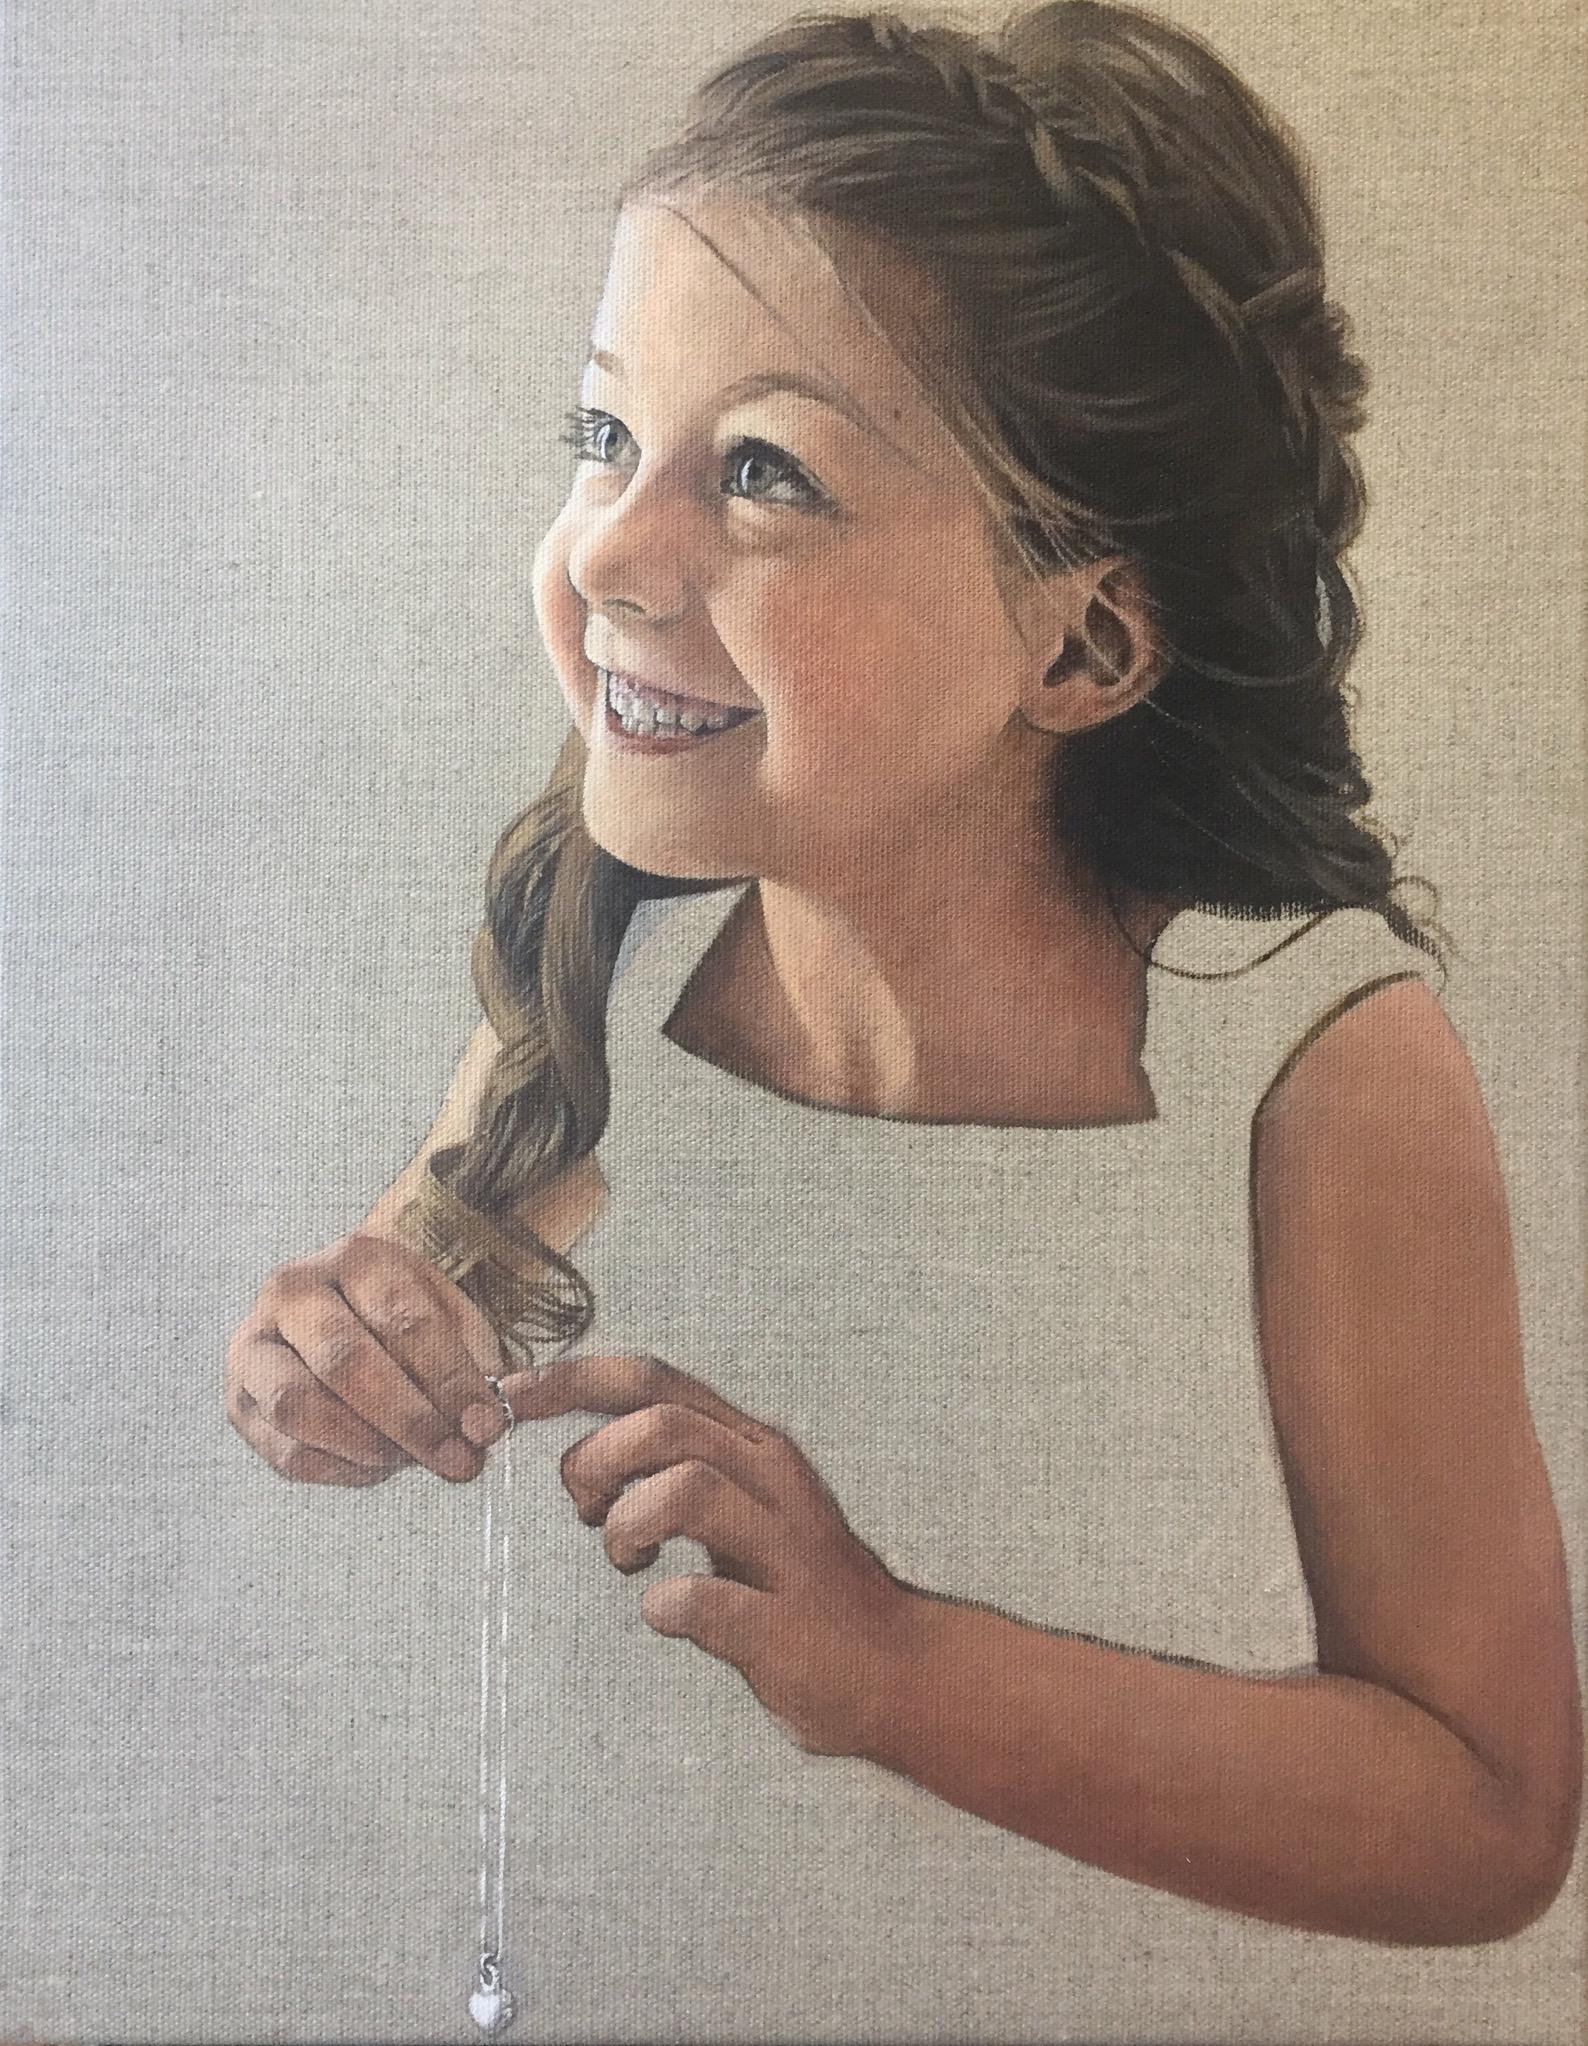 People's Choice Award Winner: 'Flower Girl' by Anna Judge